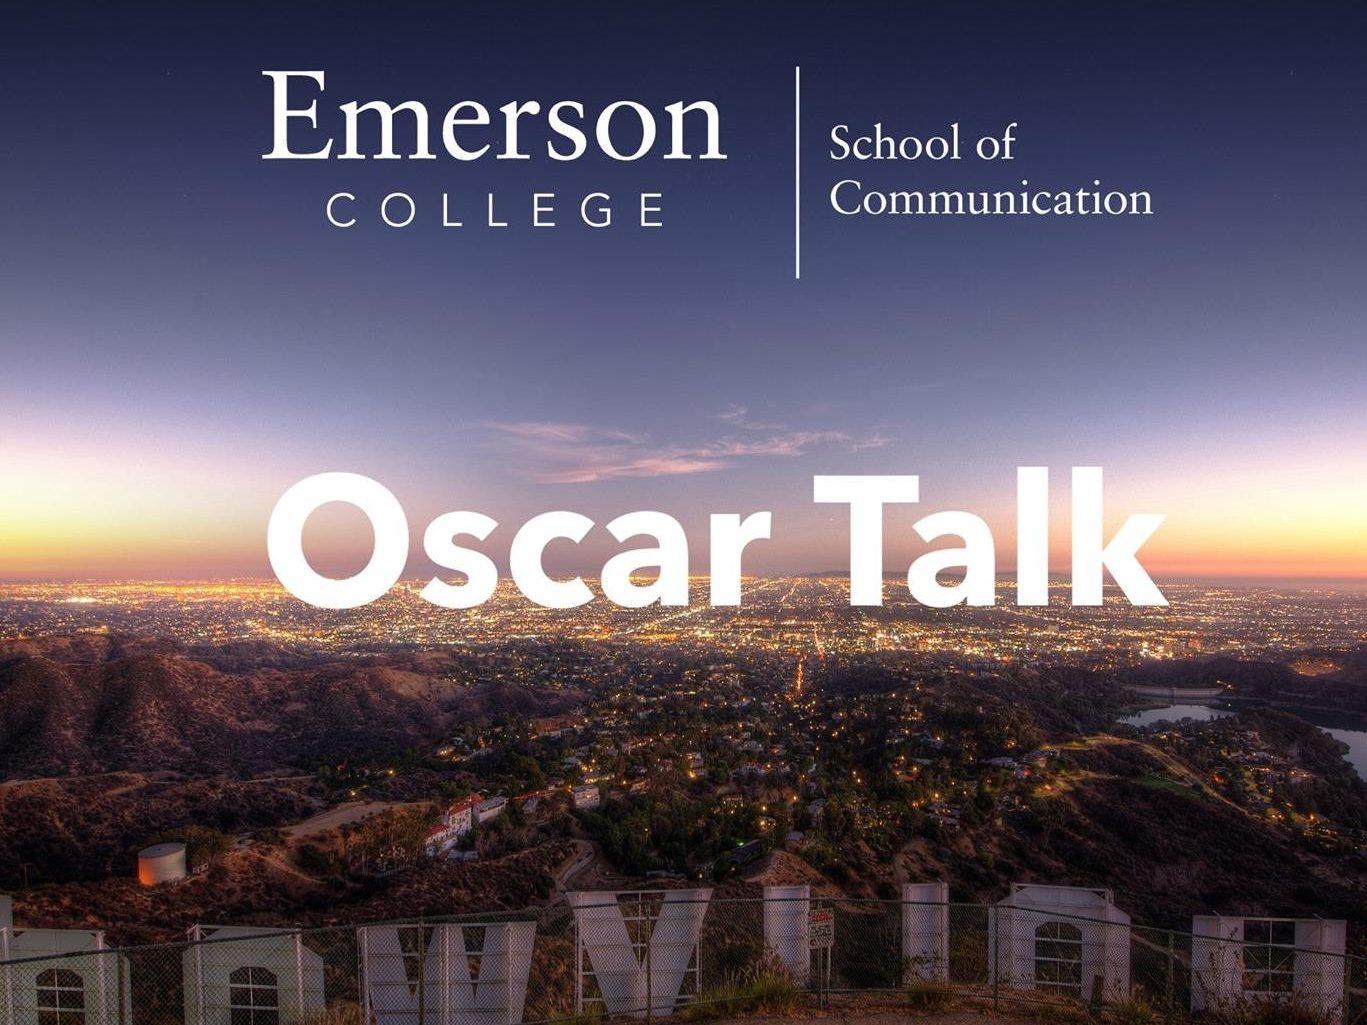 Oscar Talk image over Hollywood sign in LA